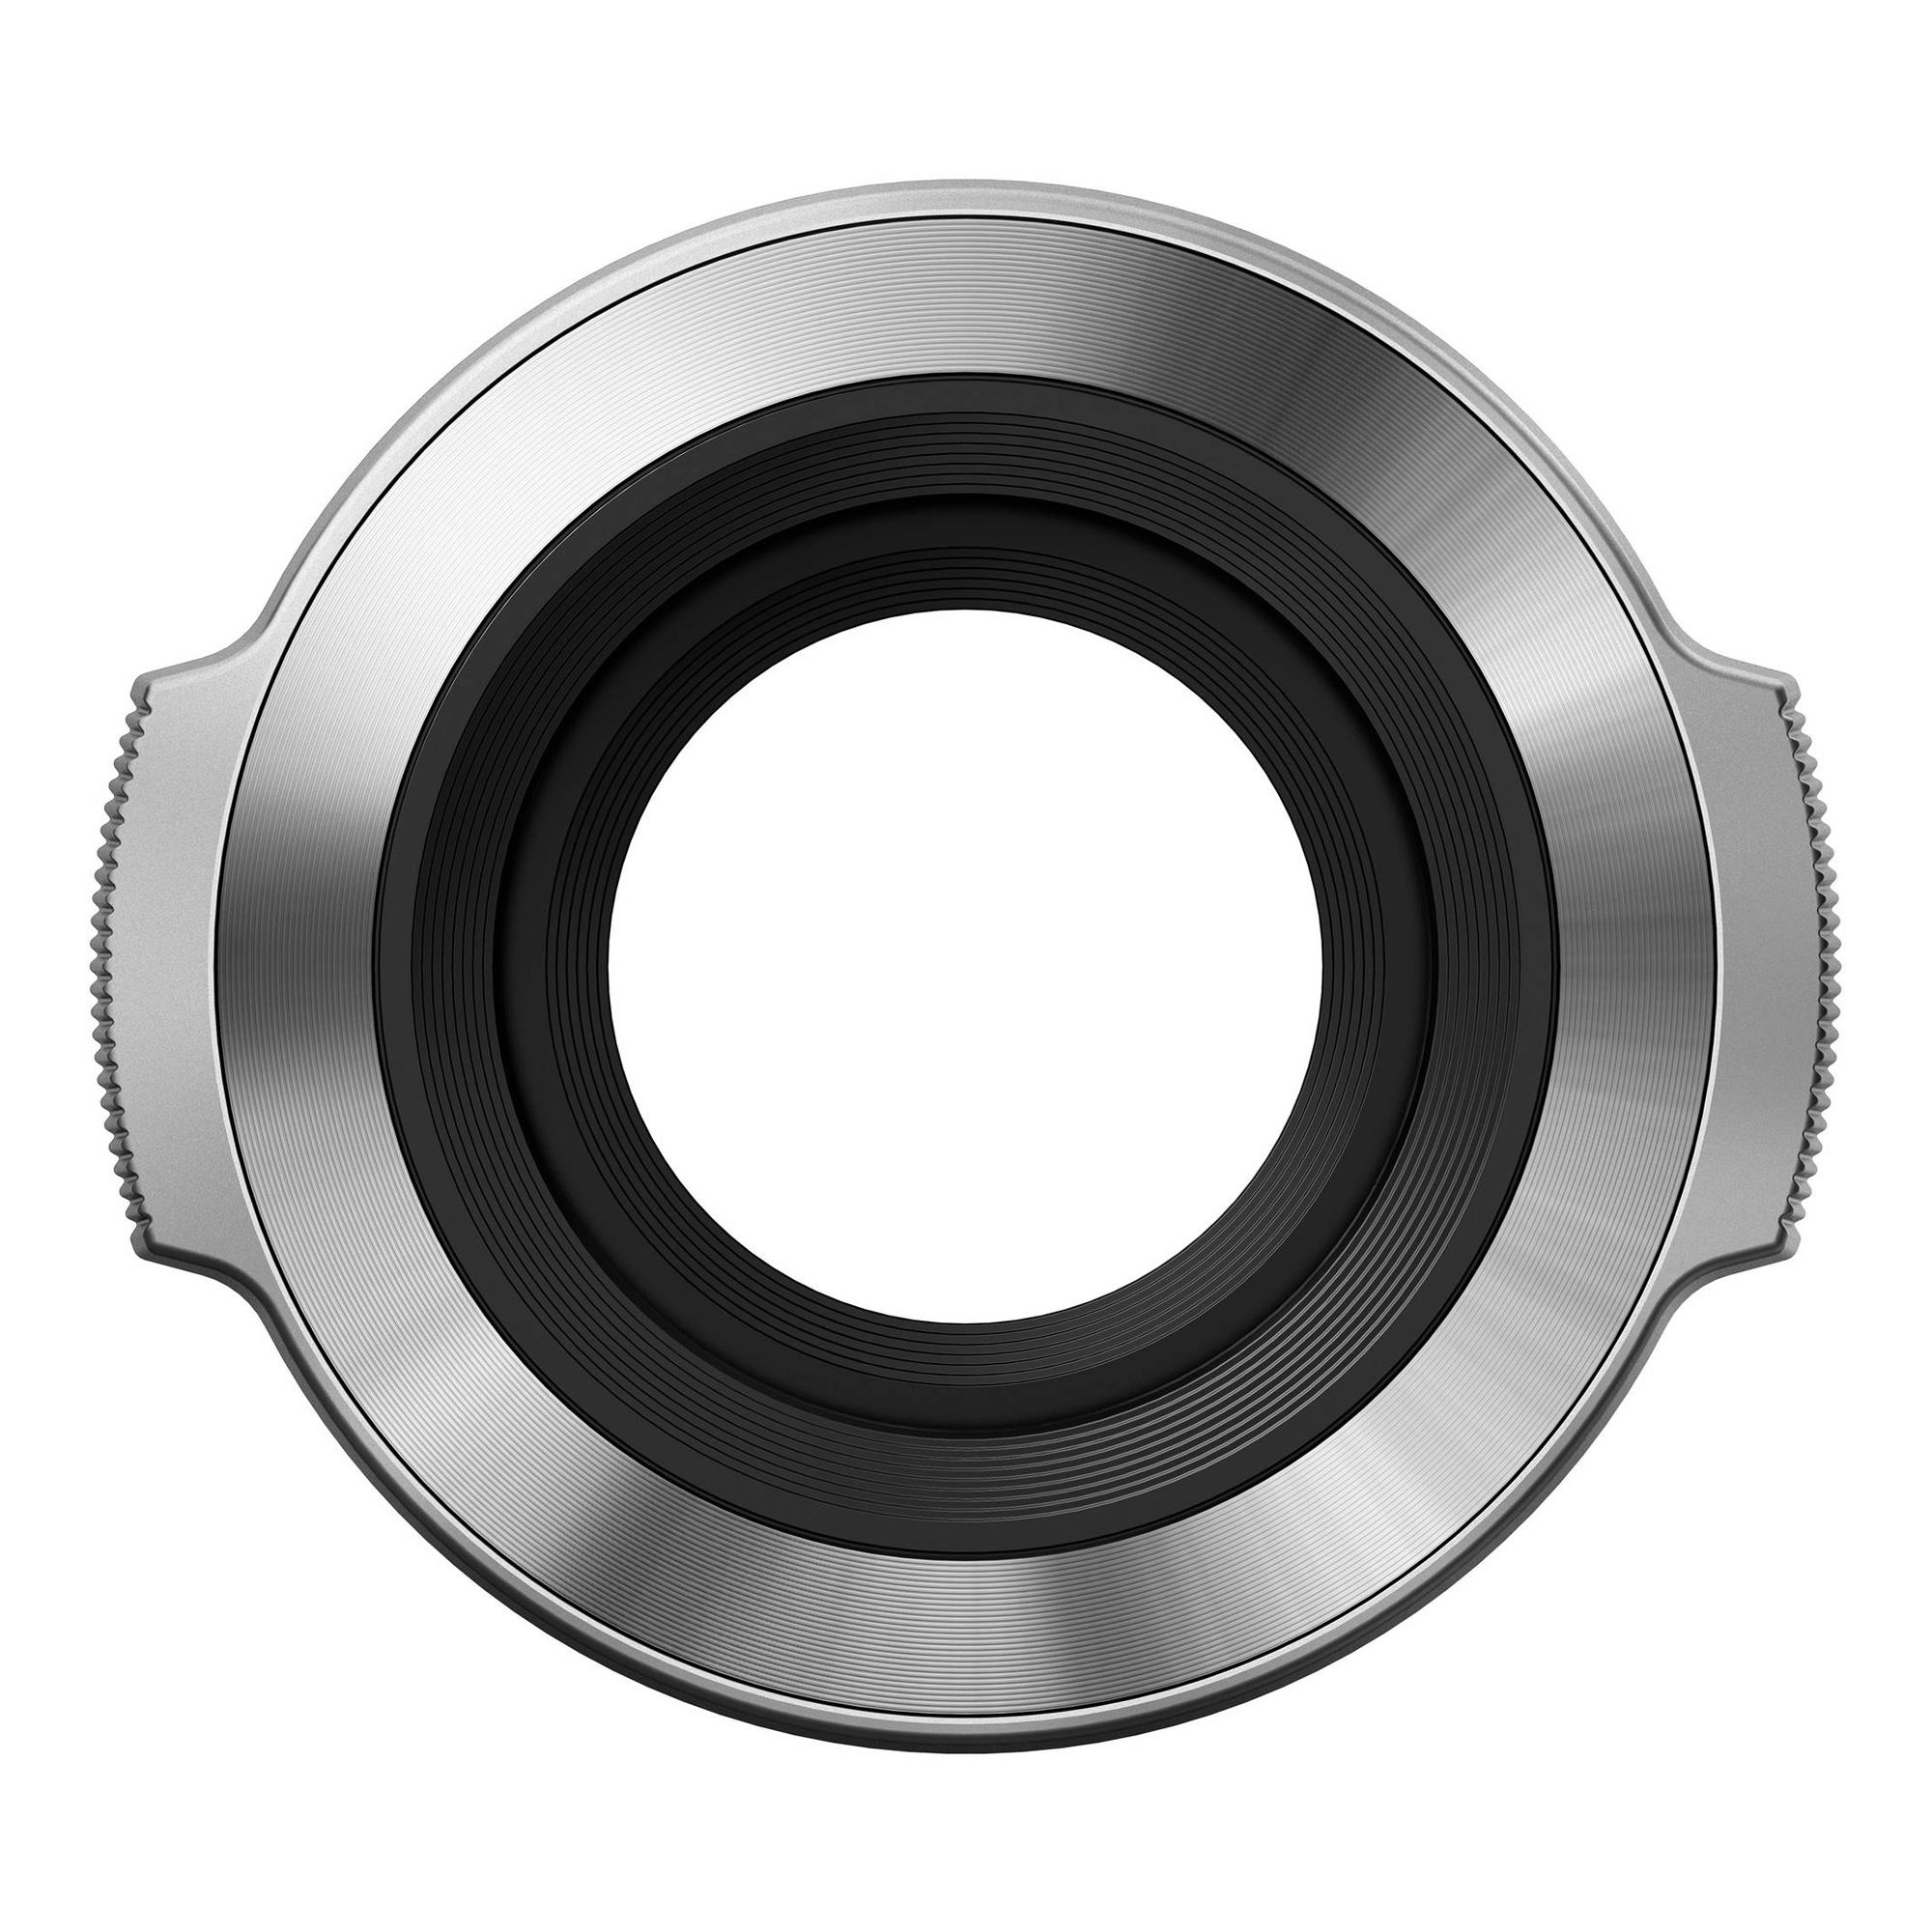 olympus lc 37c auto open lens cap for m zuiko digital ed 14 42mm f 3 5 5 6 ez l ebay. Black Bedroom Furniture Sets. Home Design Ideas